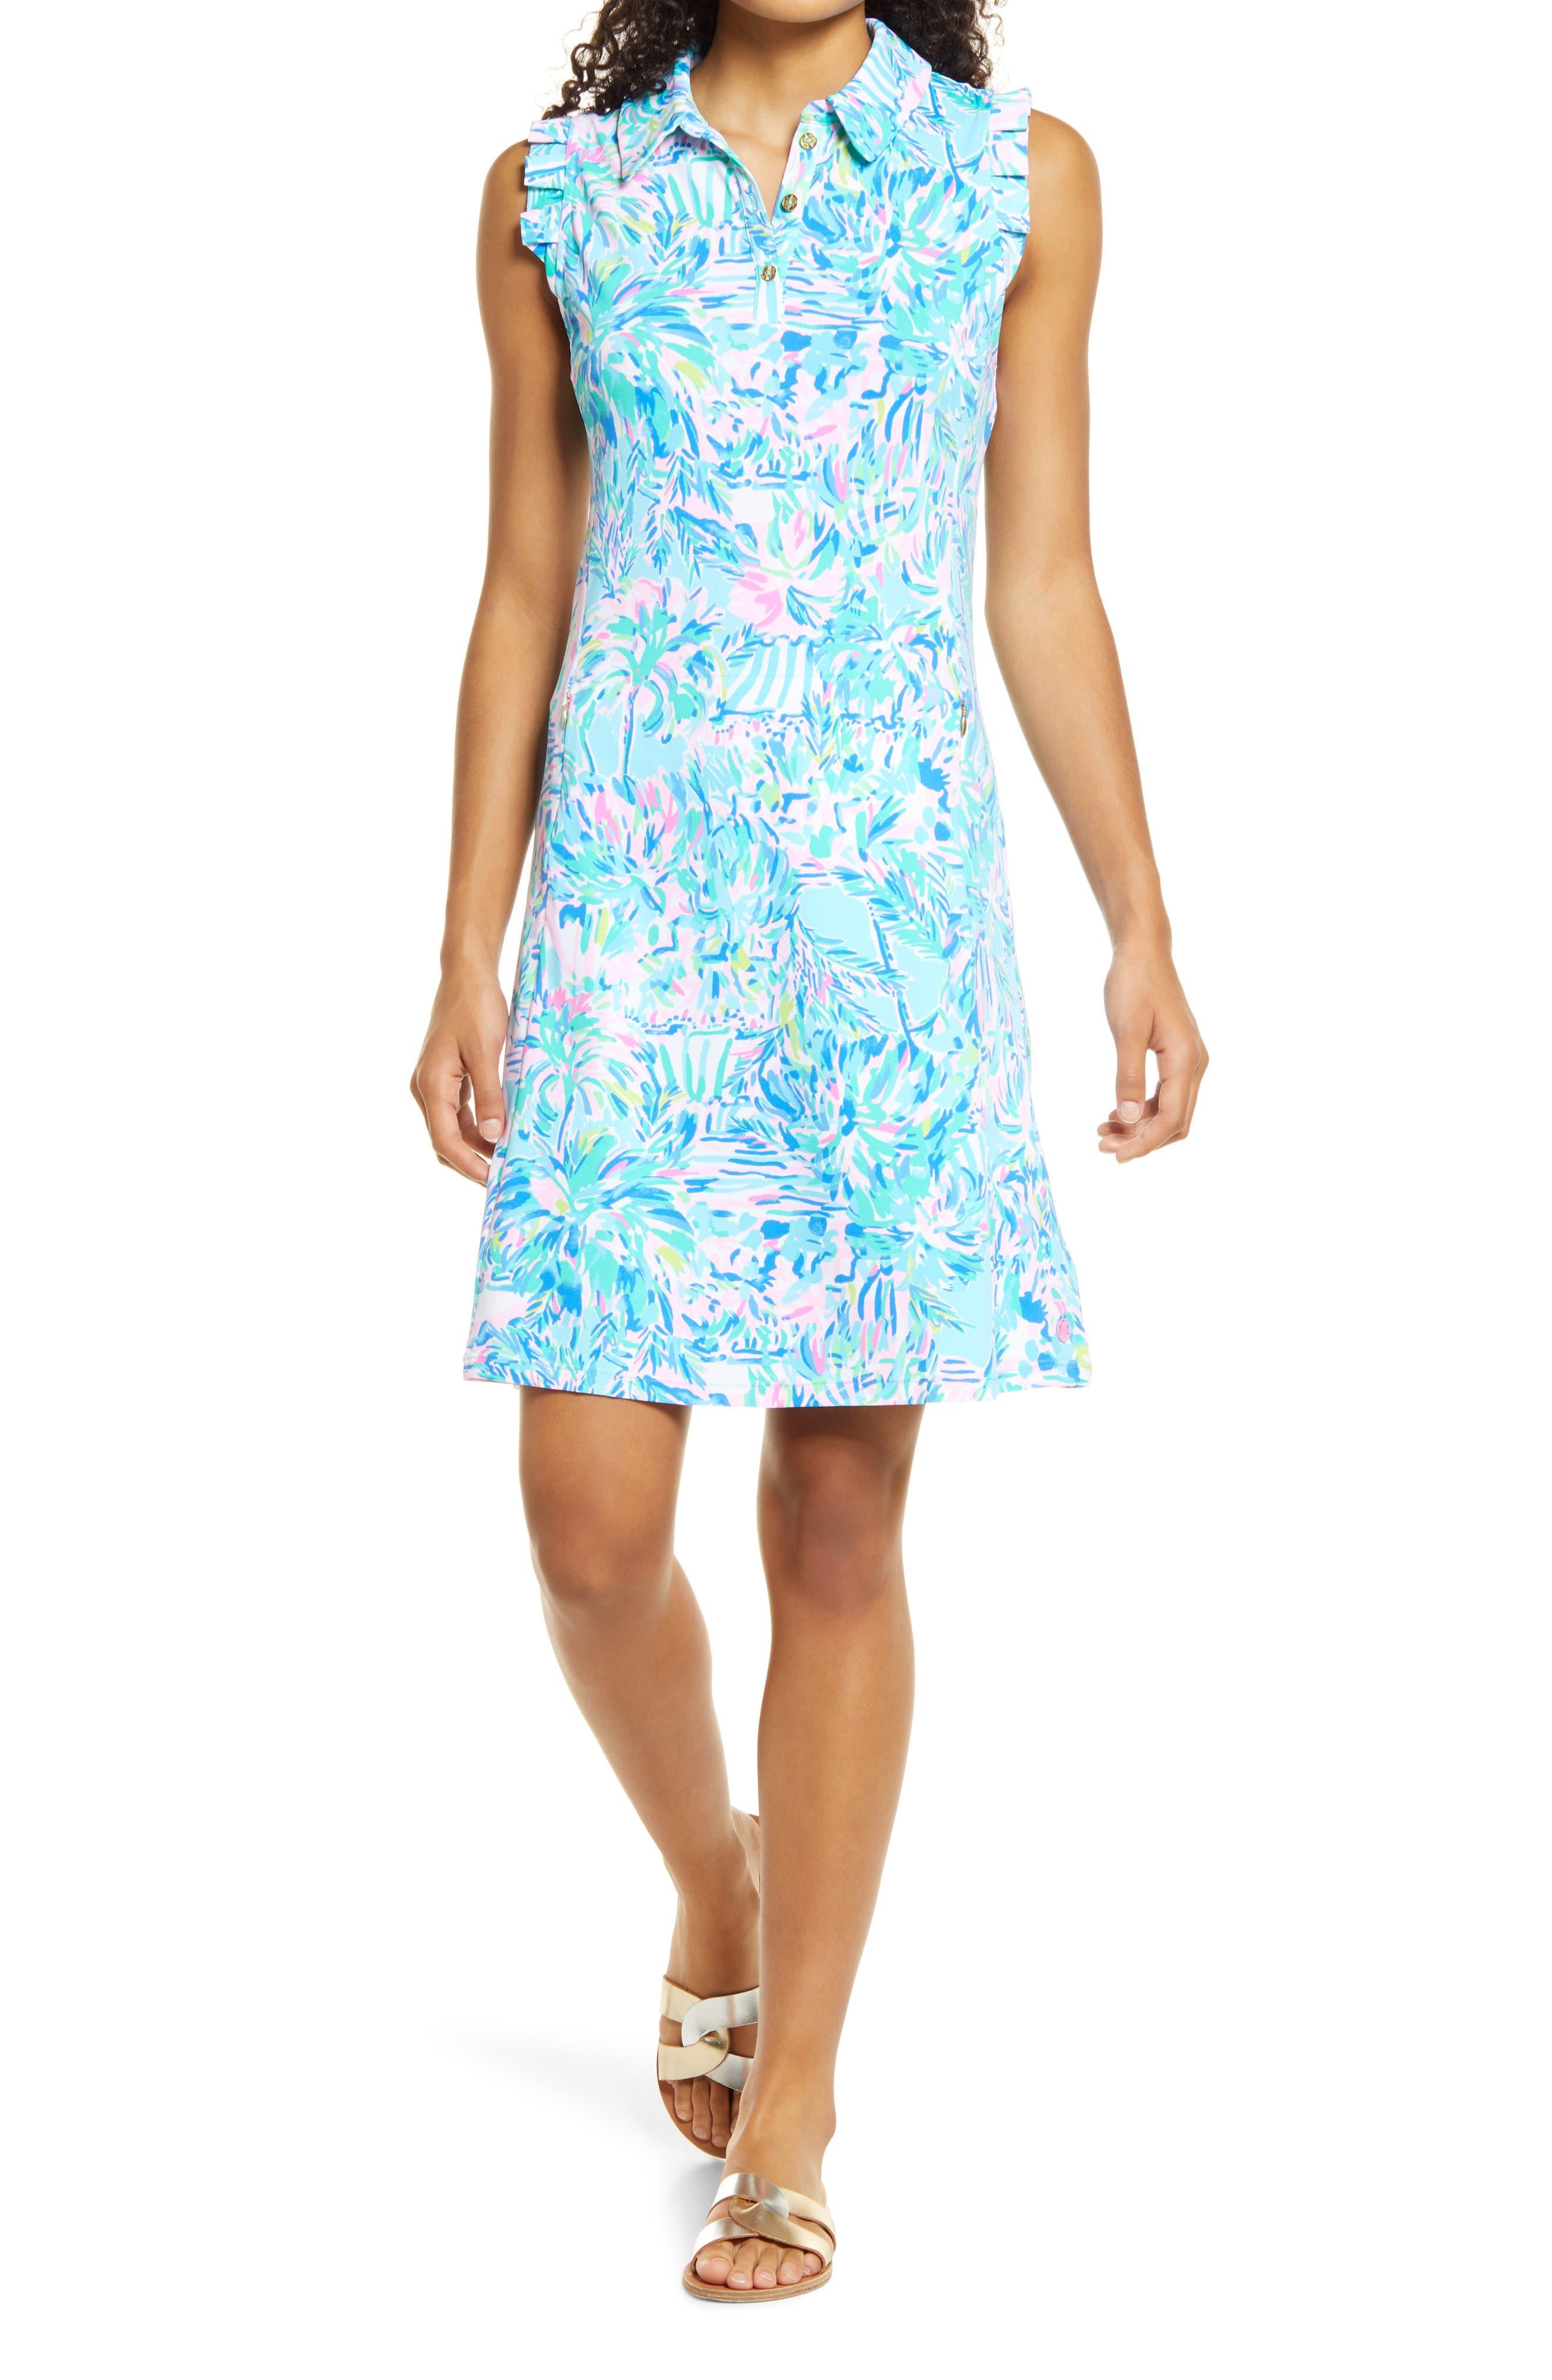 Women's Lilly Pulitzer Upf 50+ Floral Sleeveless Dress & Shorts Set